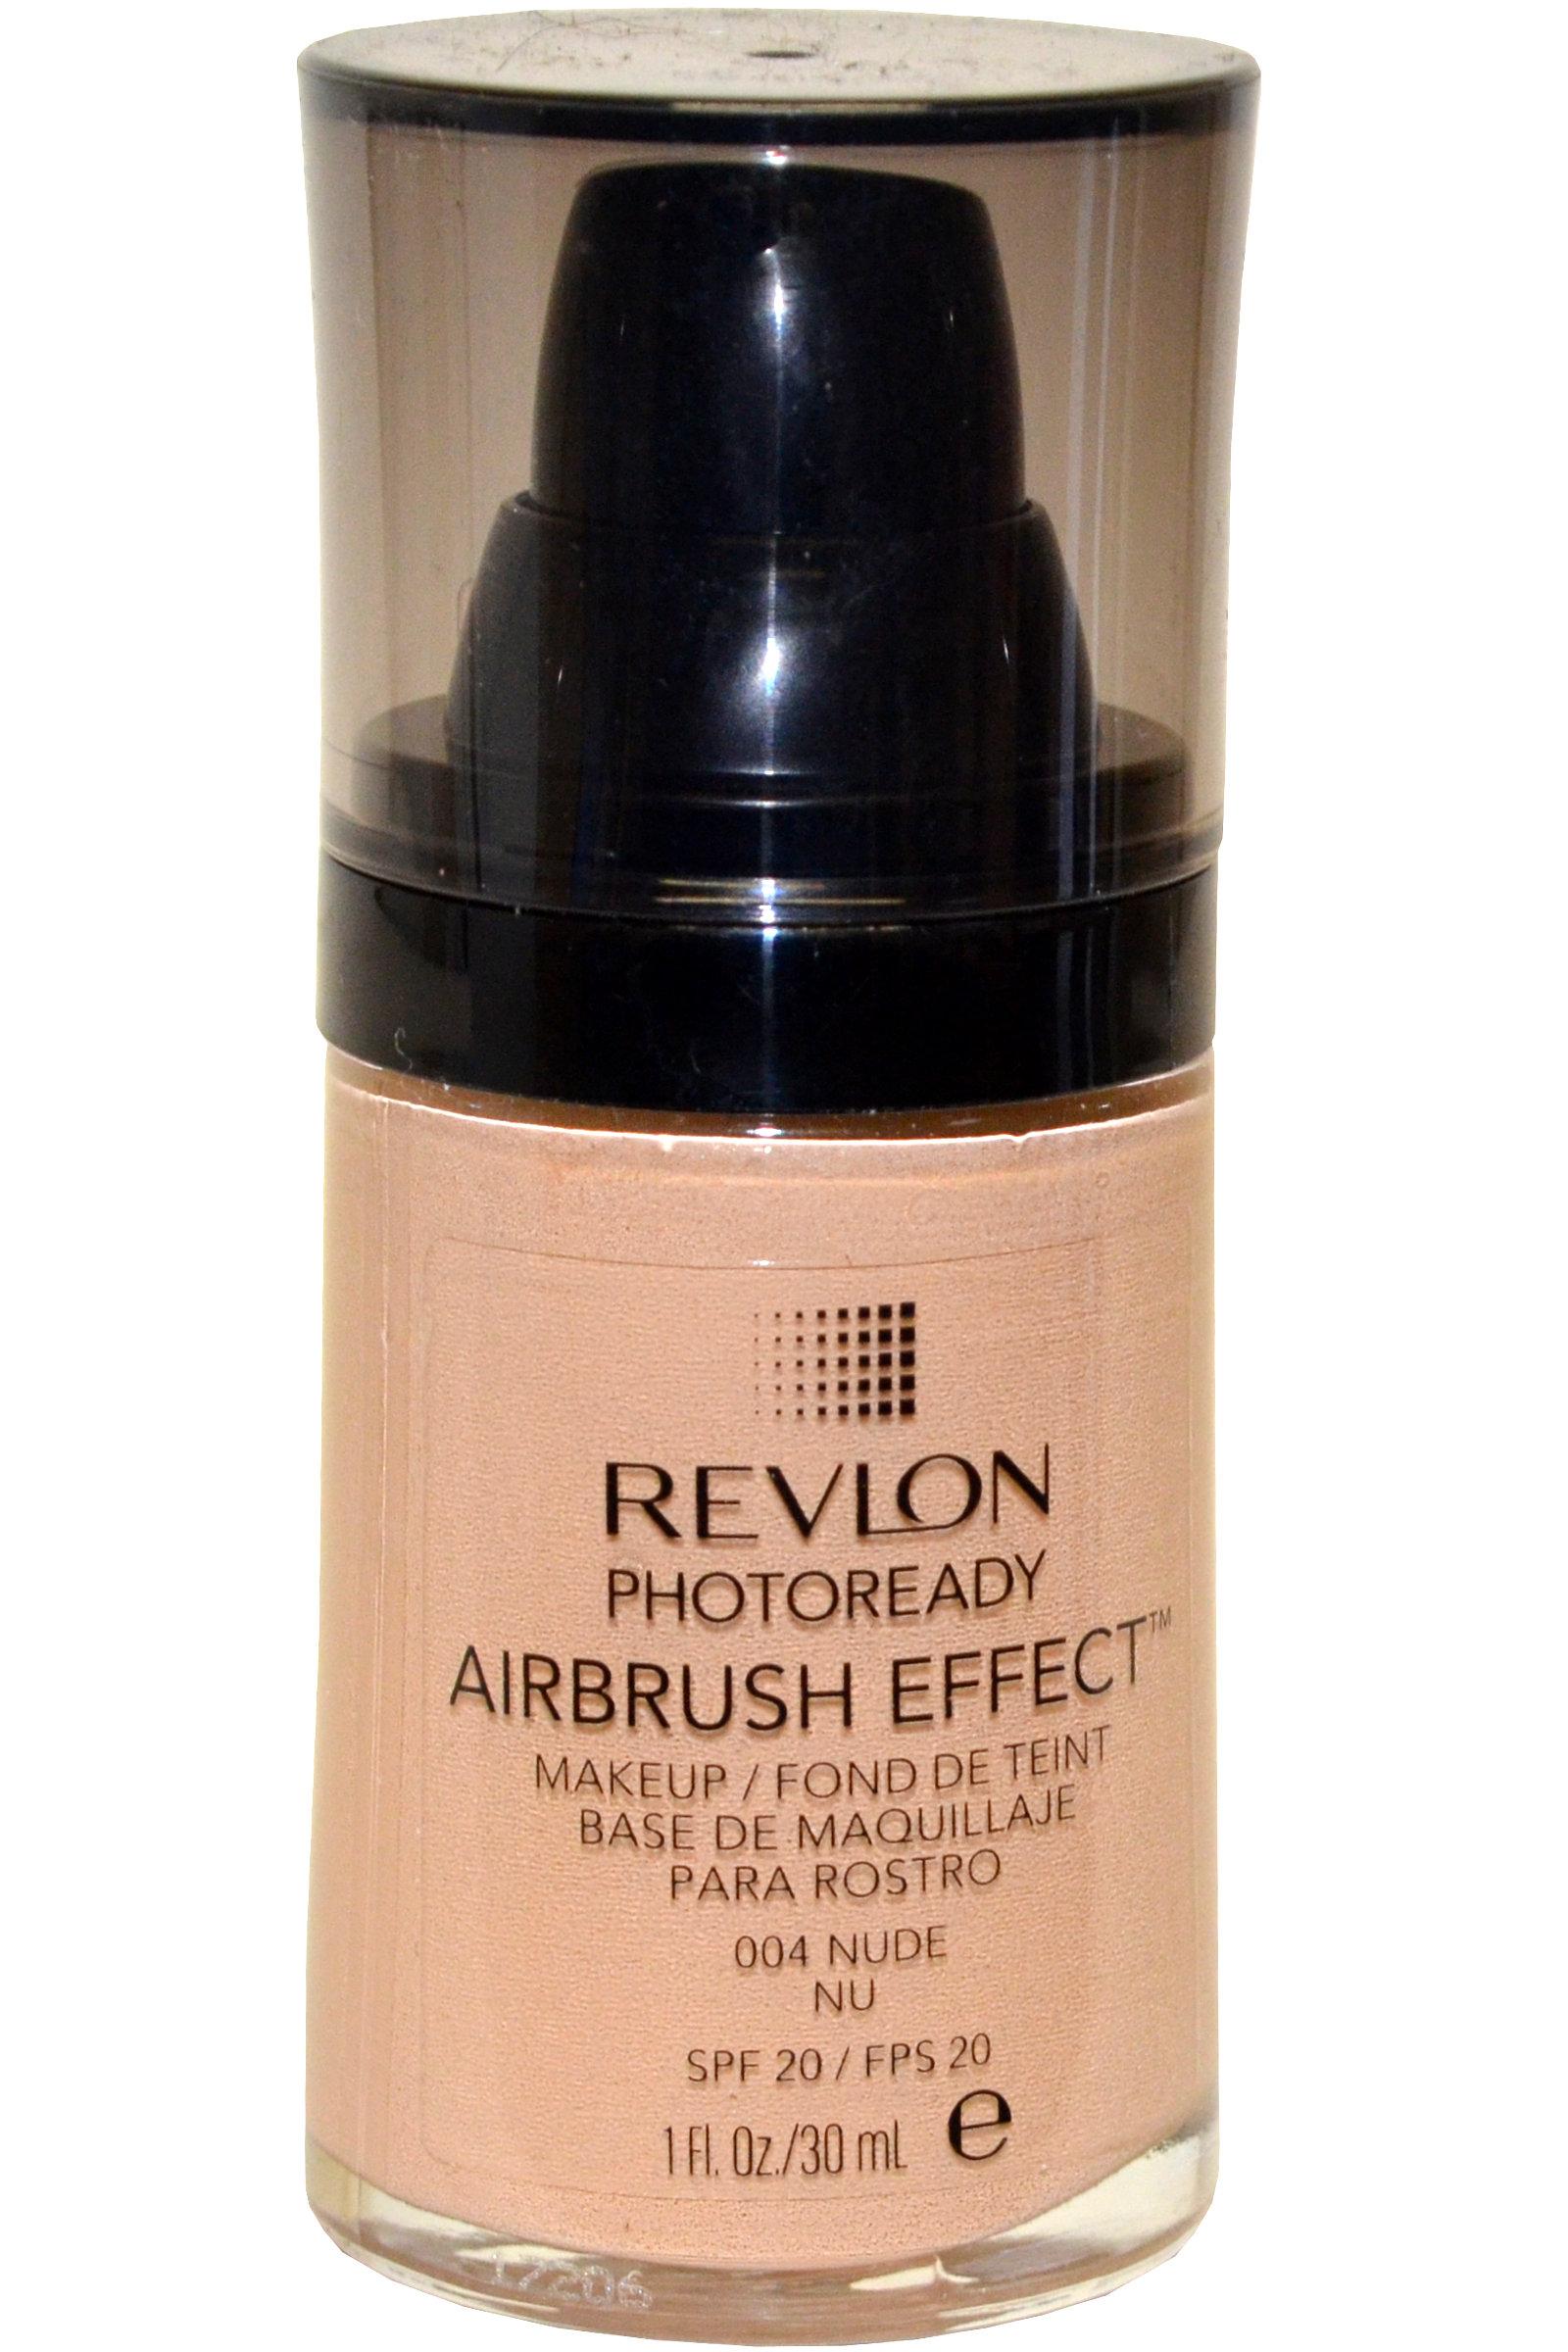 Revlon PhotoReady Airbrush Effect Makeup Nude 004 1 oz